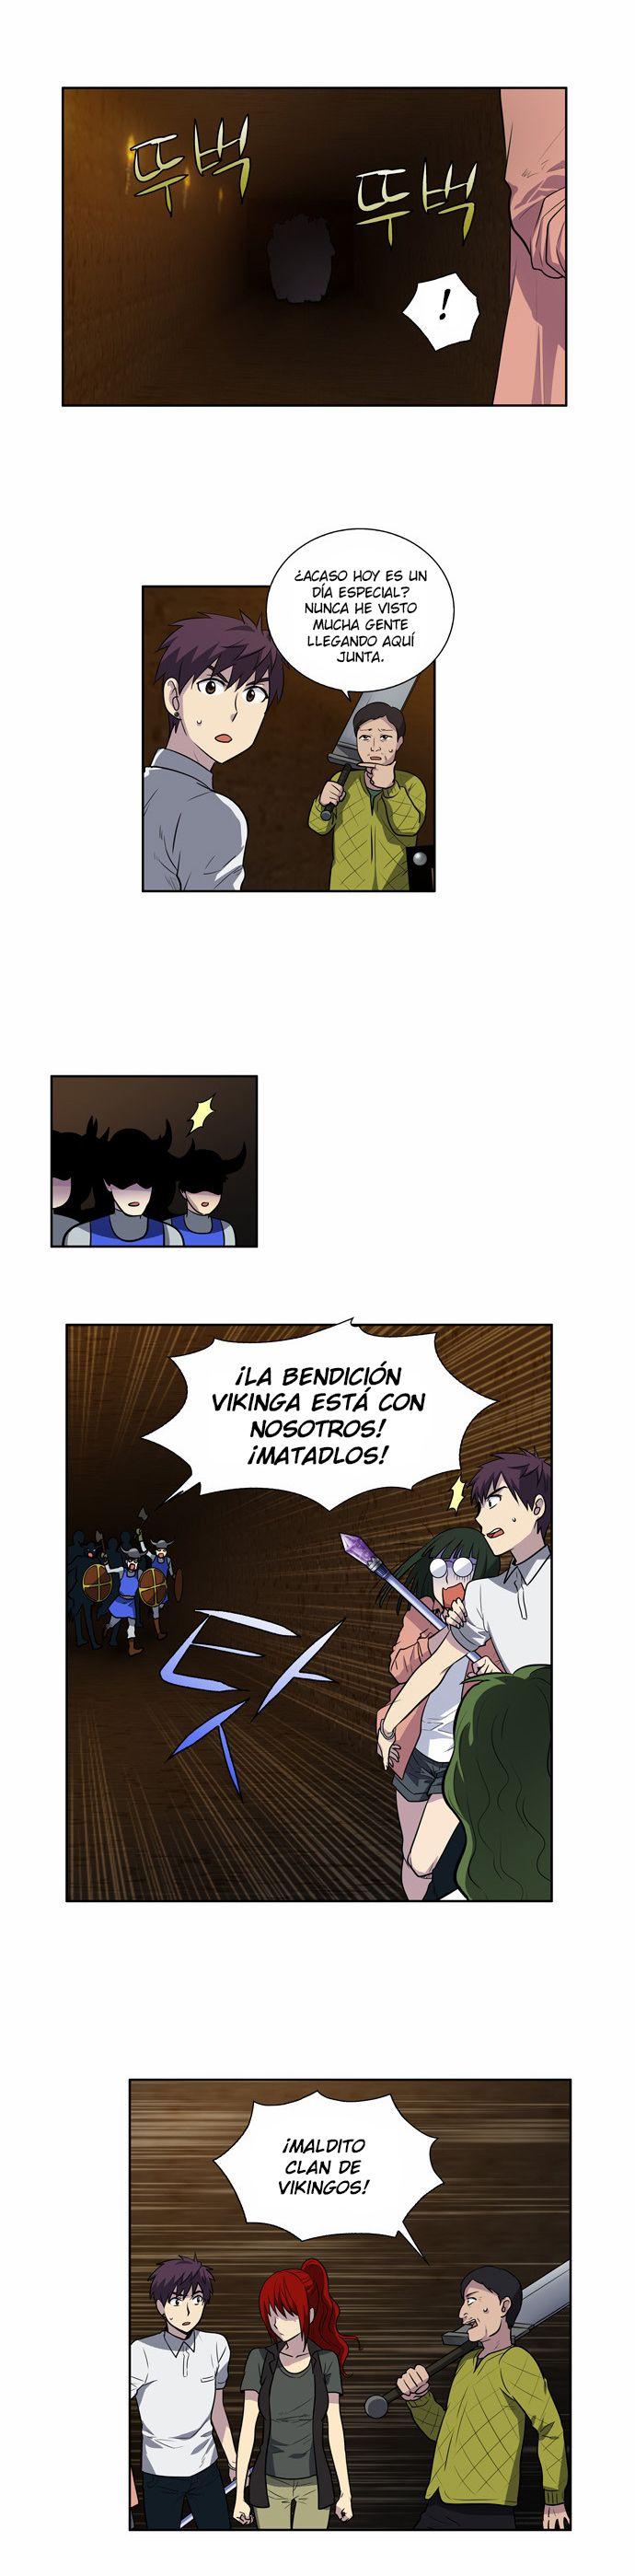 https://c5.ninemanga.com/es_manga/61/1725/479869/232cb406f90fb05666d177dd85d81a3e.jpg Page 6